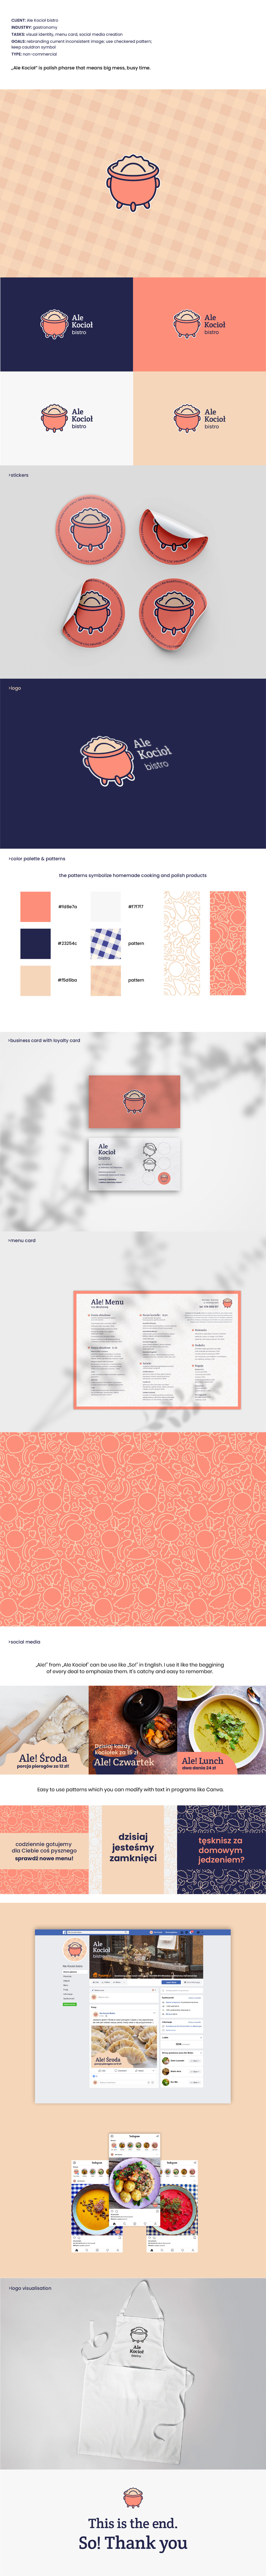 buisness card logo loyalty card Menu Card Patterns Signet social media stickers visual identity